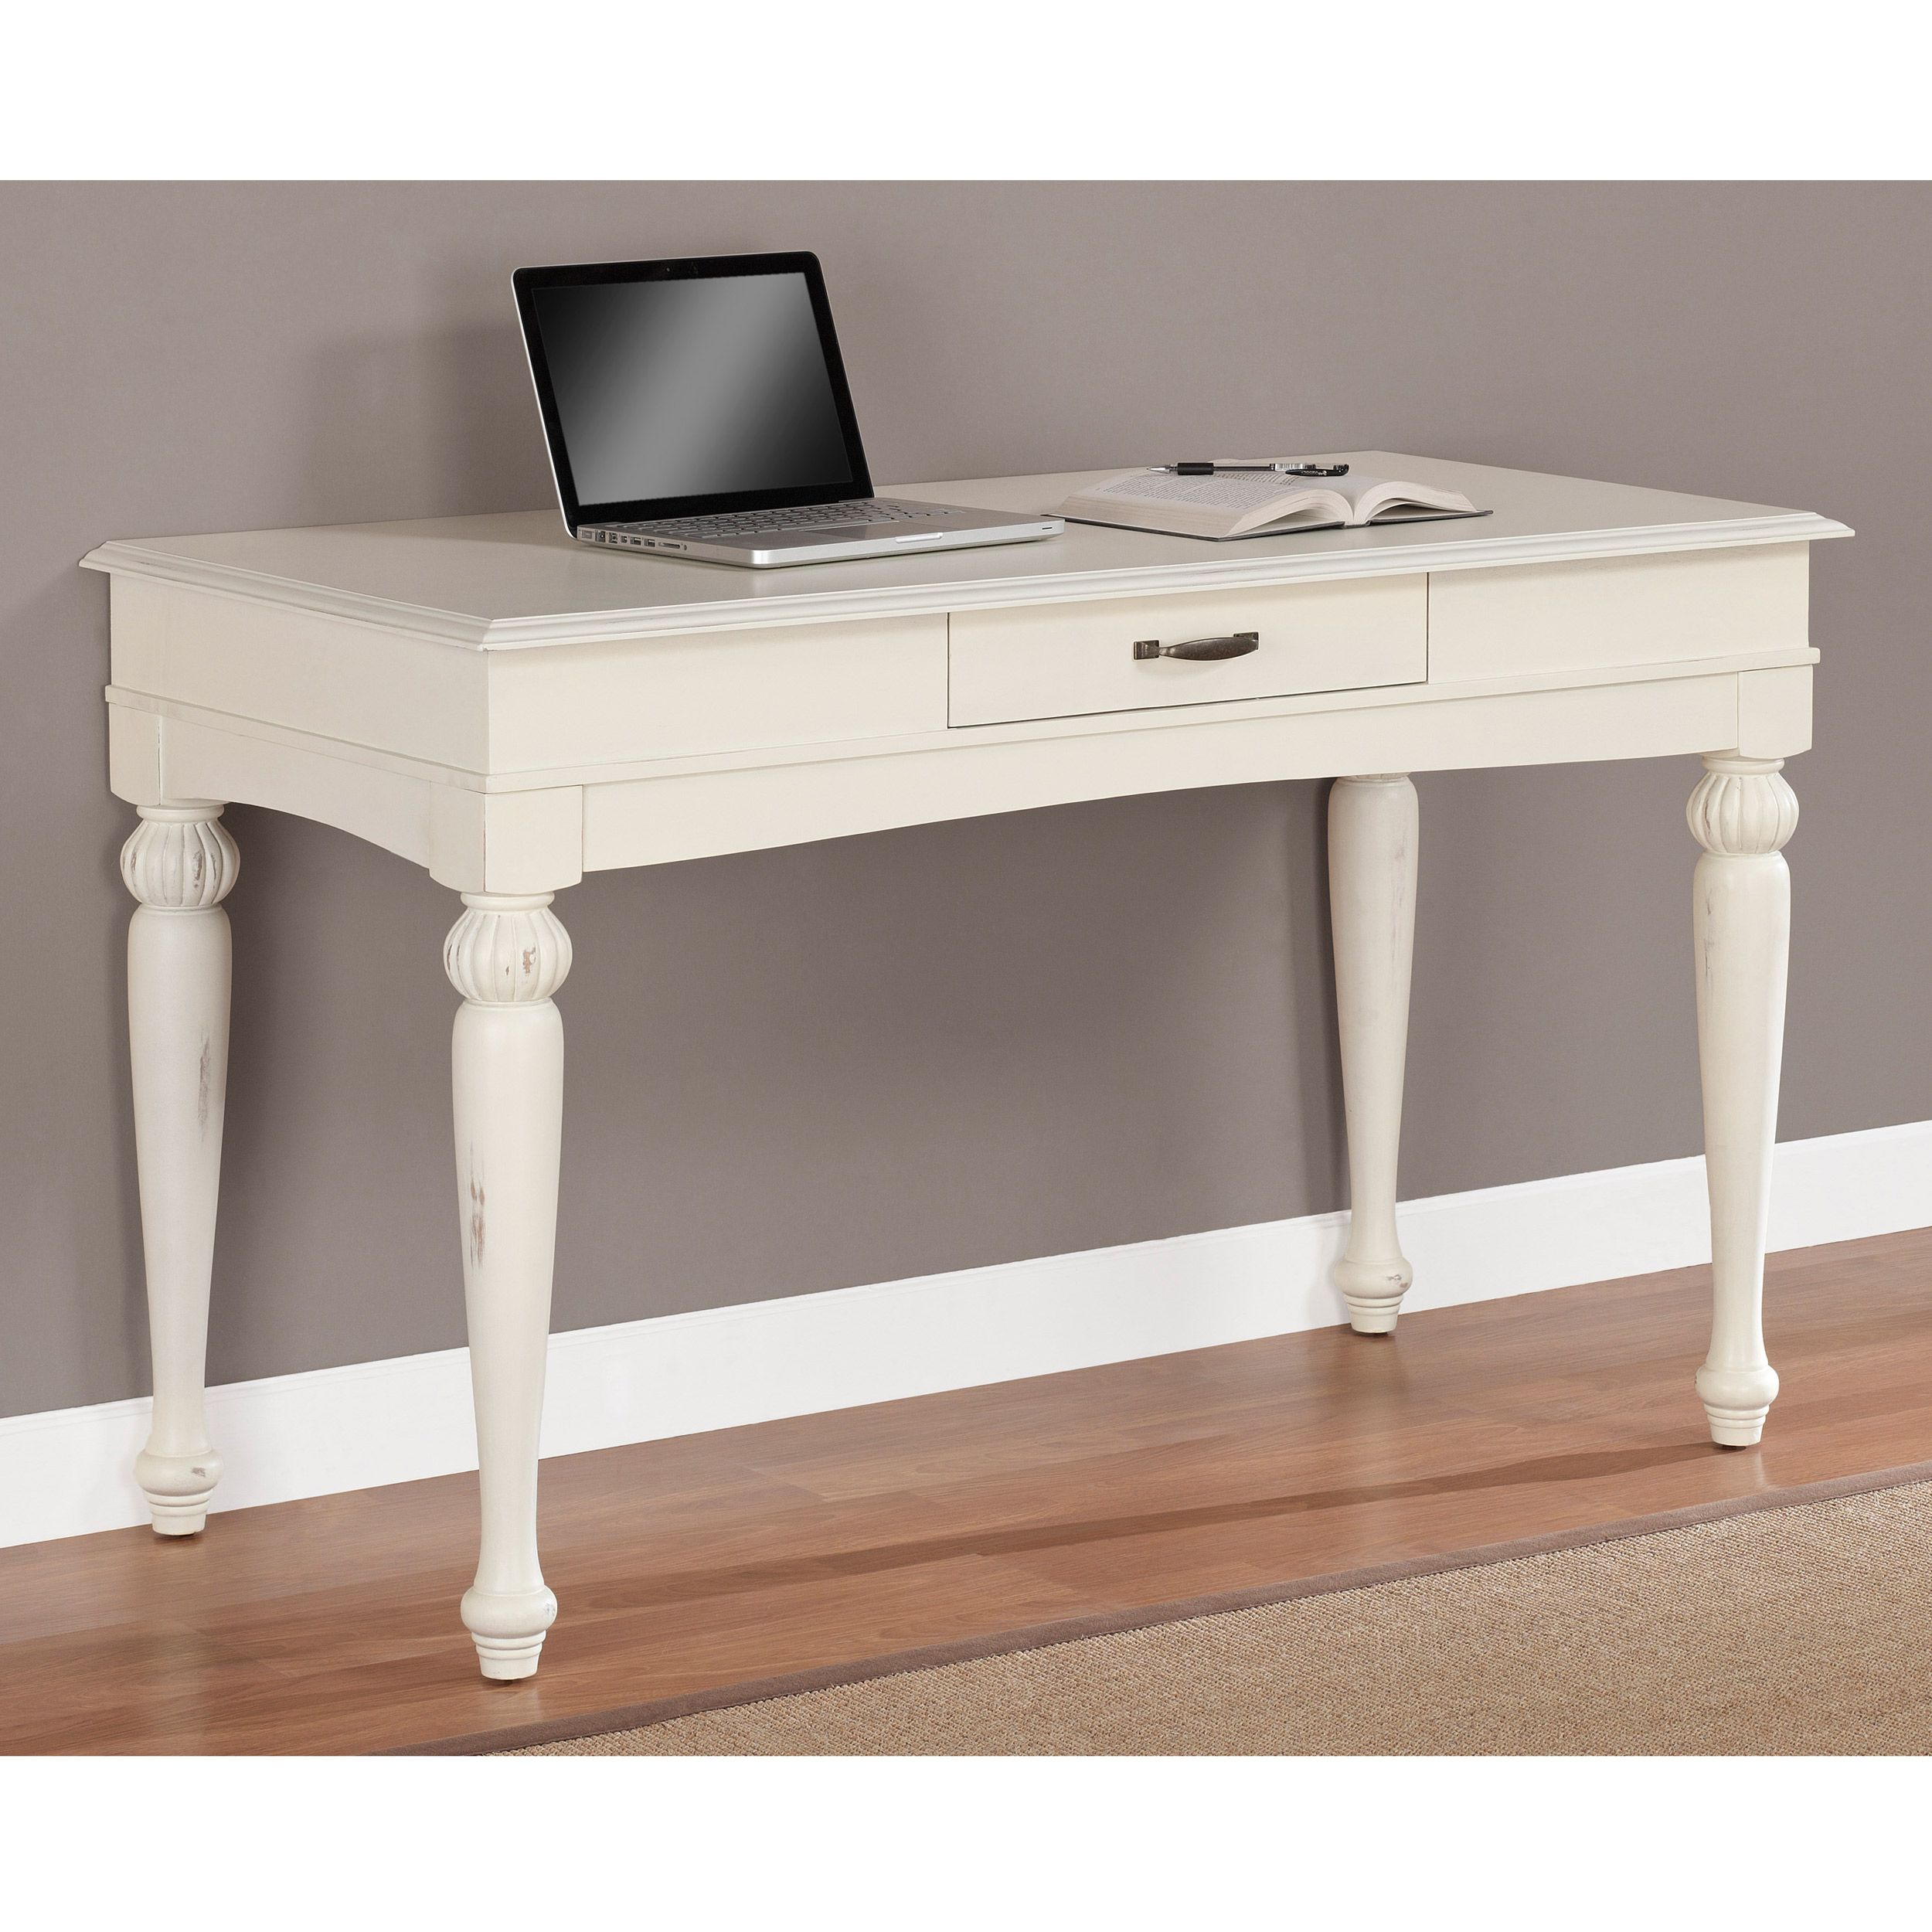 $261  Vanilla Wasatch One Drawer Desk  Overstock Shopping